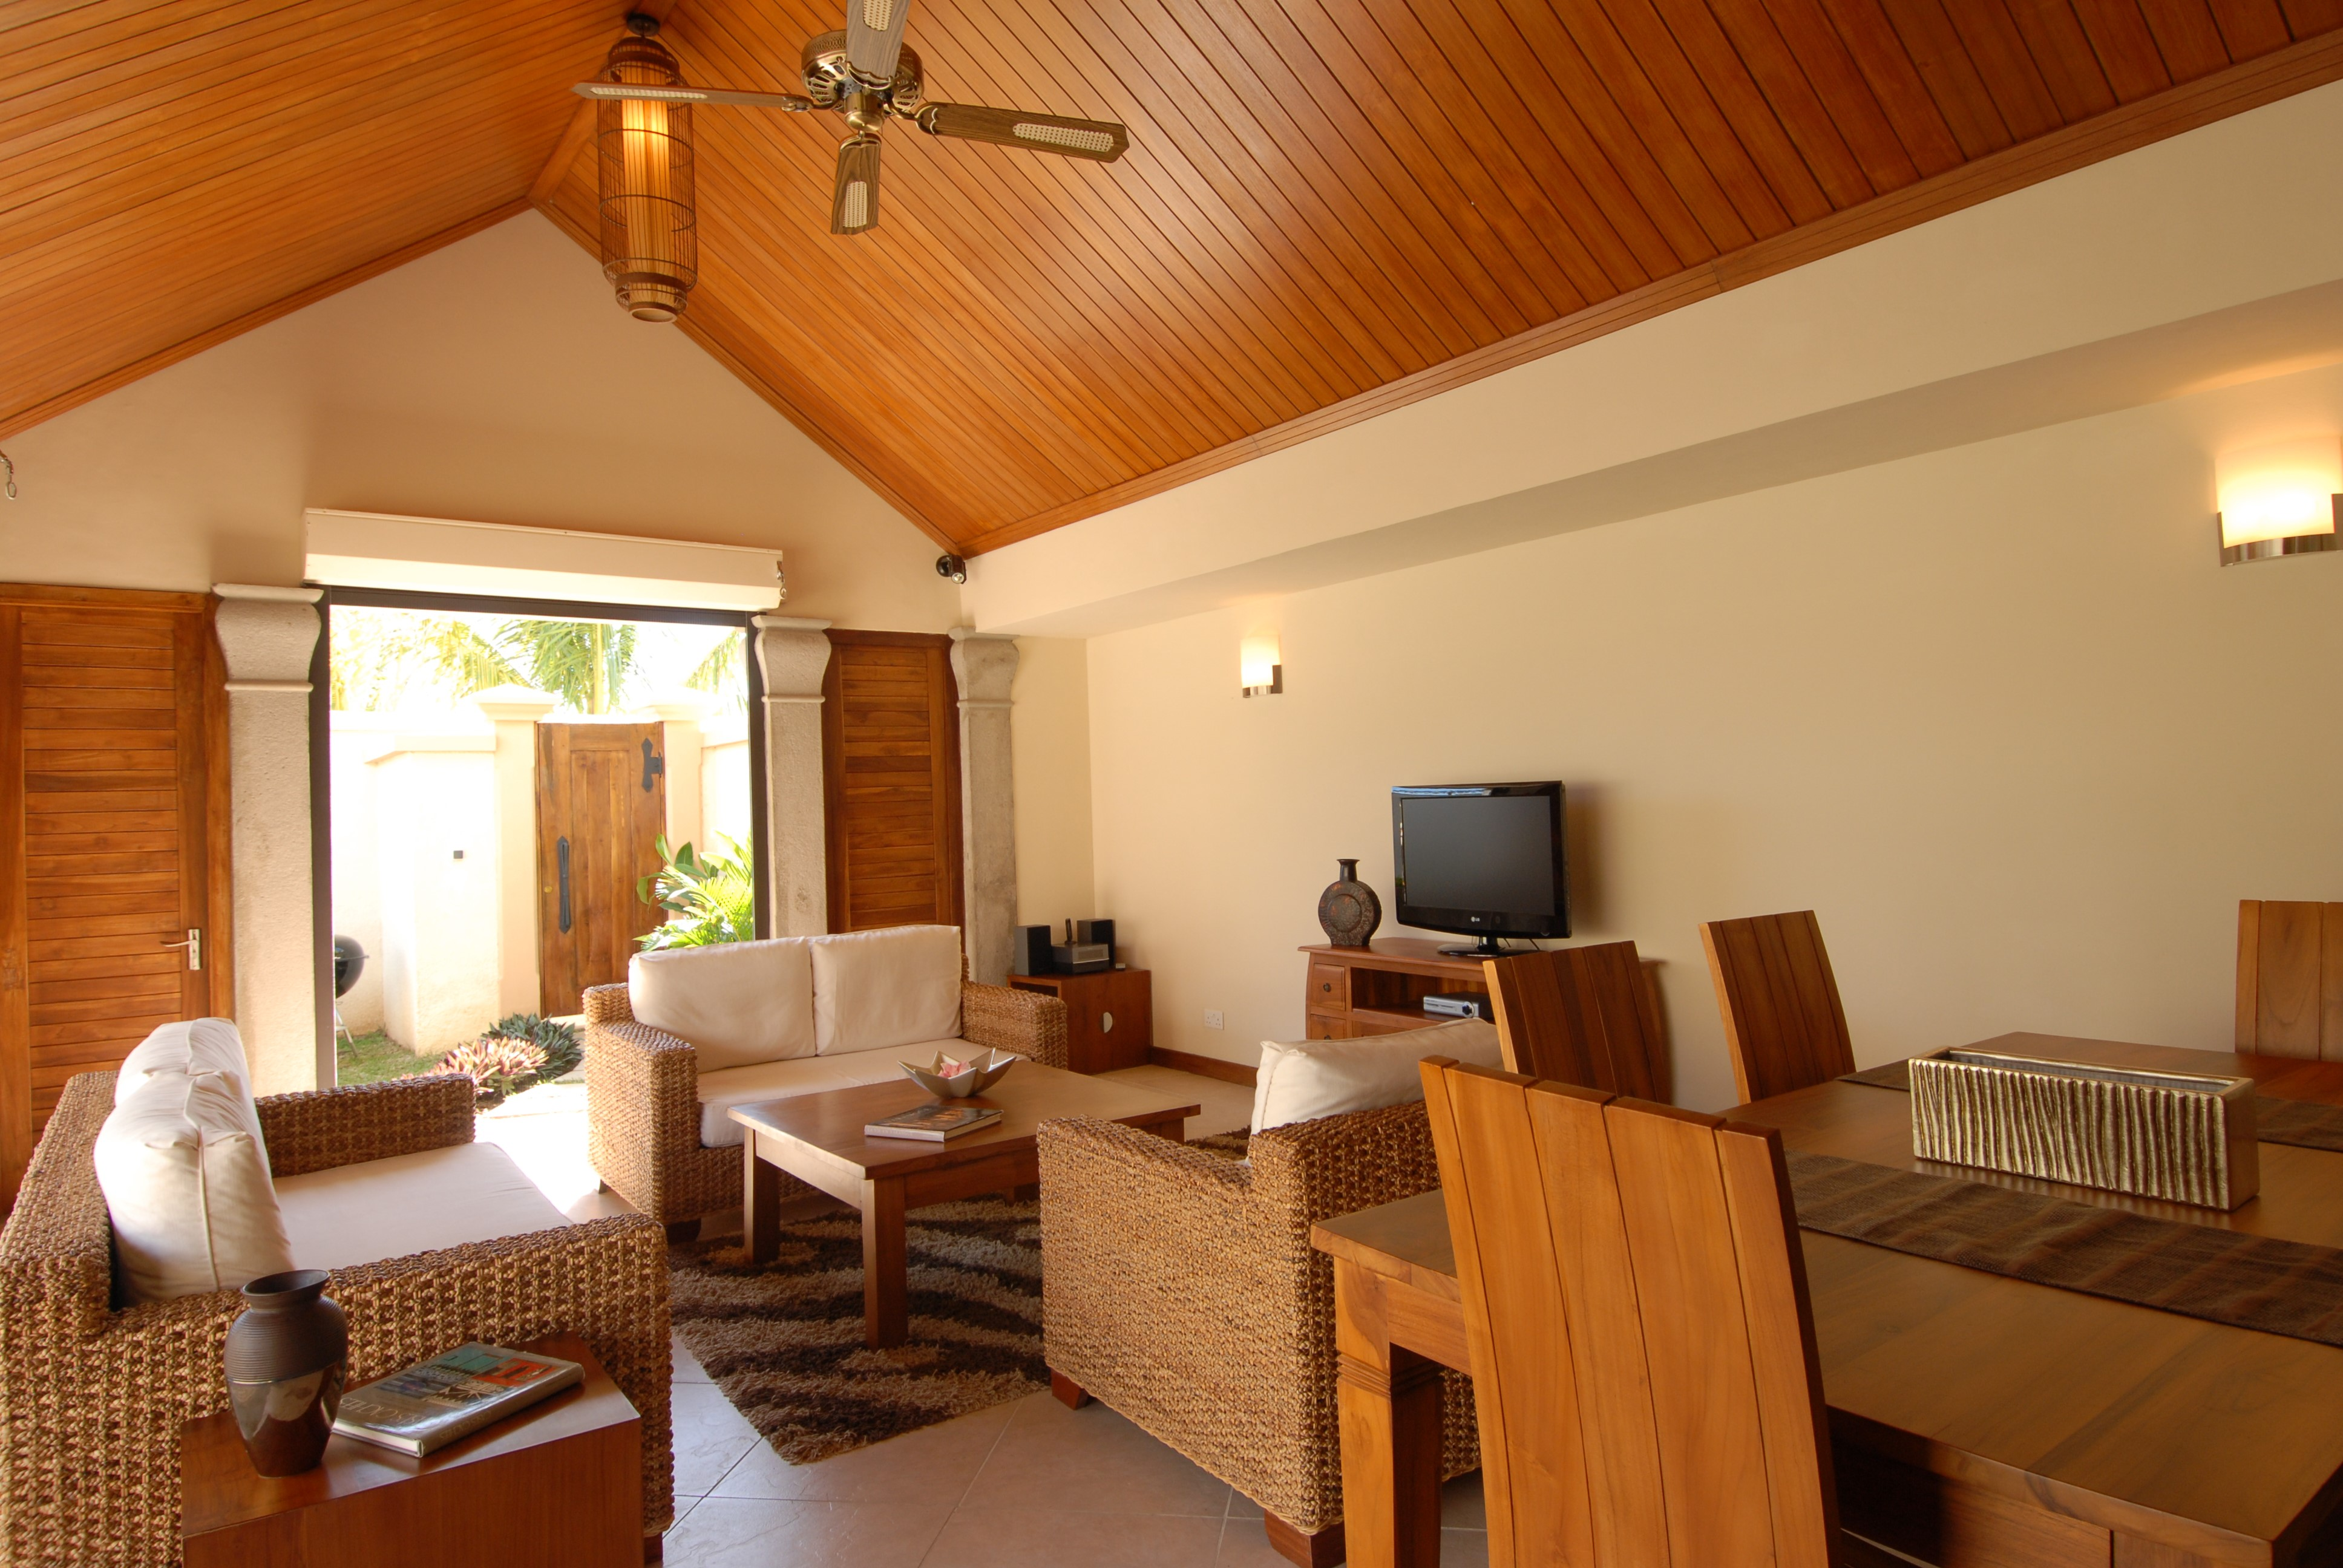 Location villa de luxe grand baie 2 pers avec piscine for Hotels de reve en france